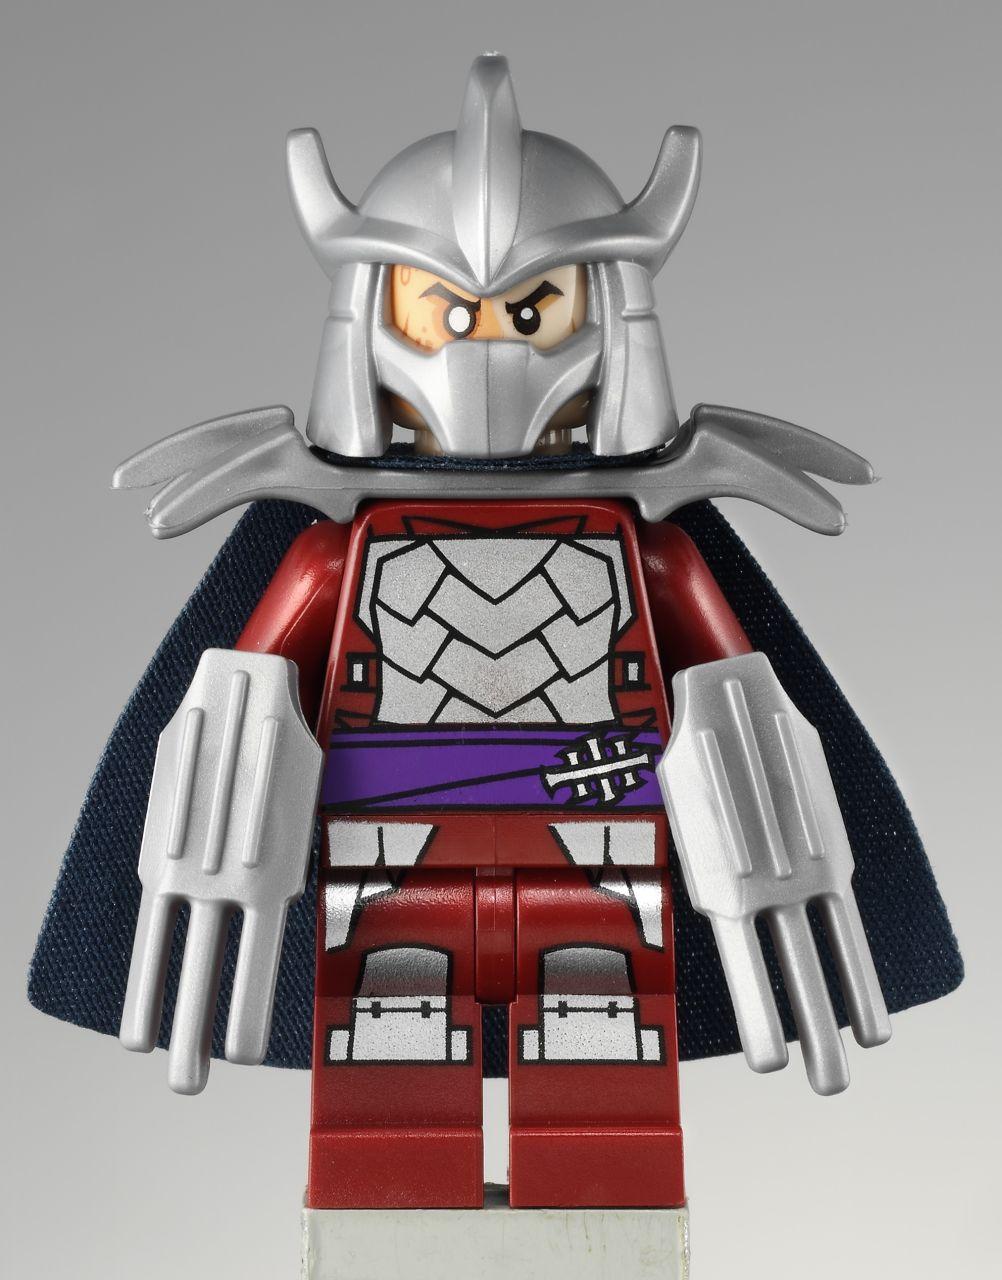 Image - Lego-TMNT-Shredder 1349964423.jpg | TMNT Wiki | FANDOM ...